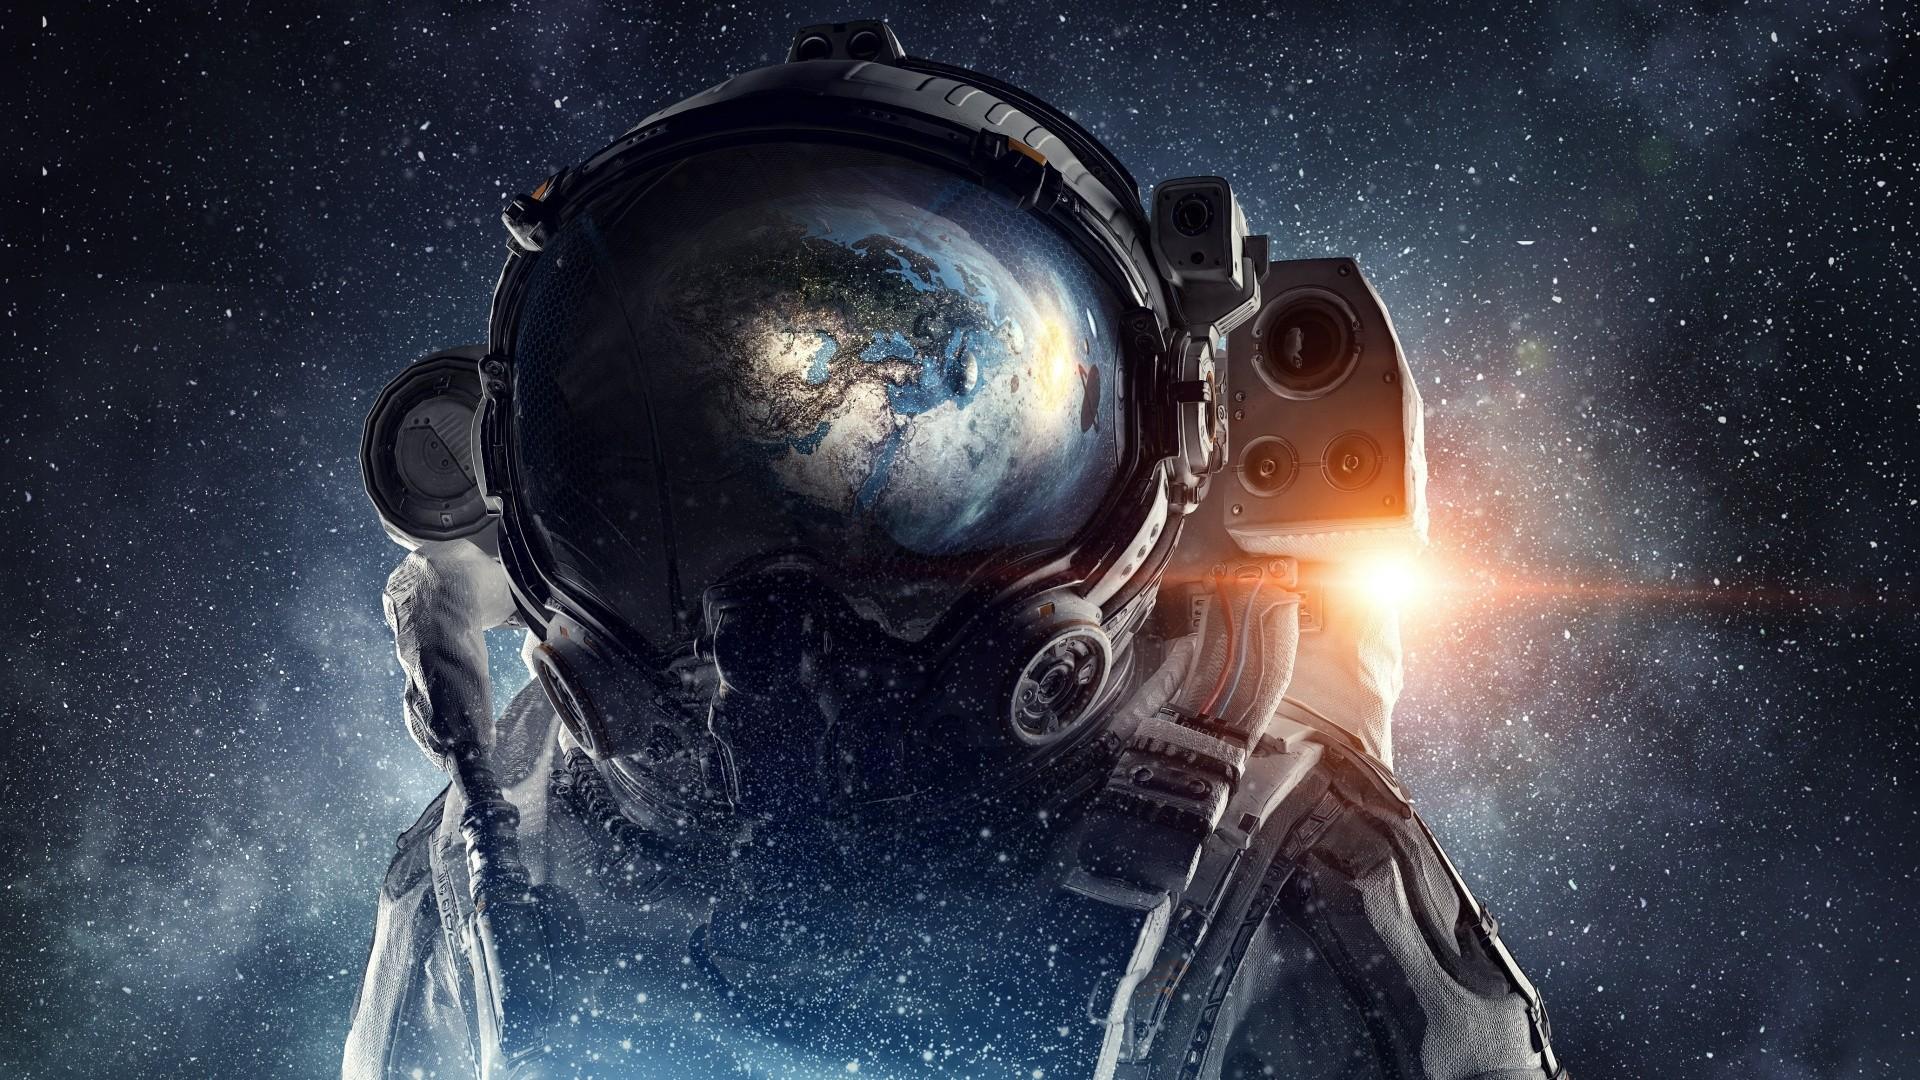 Astronaut High Quality